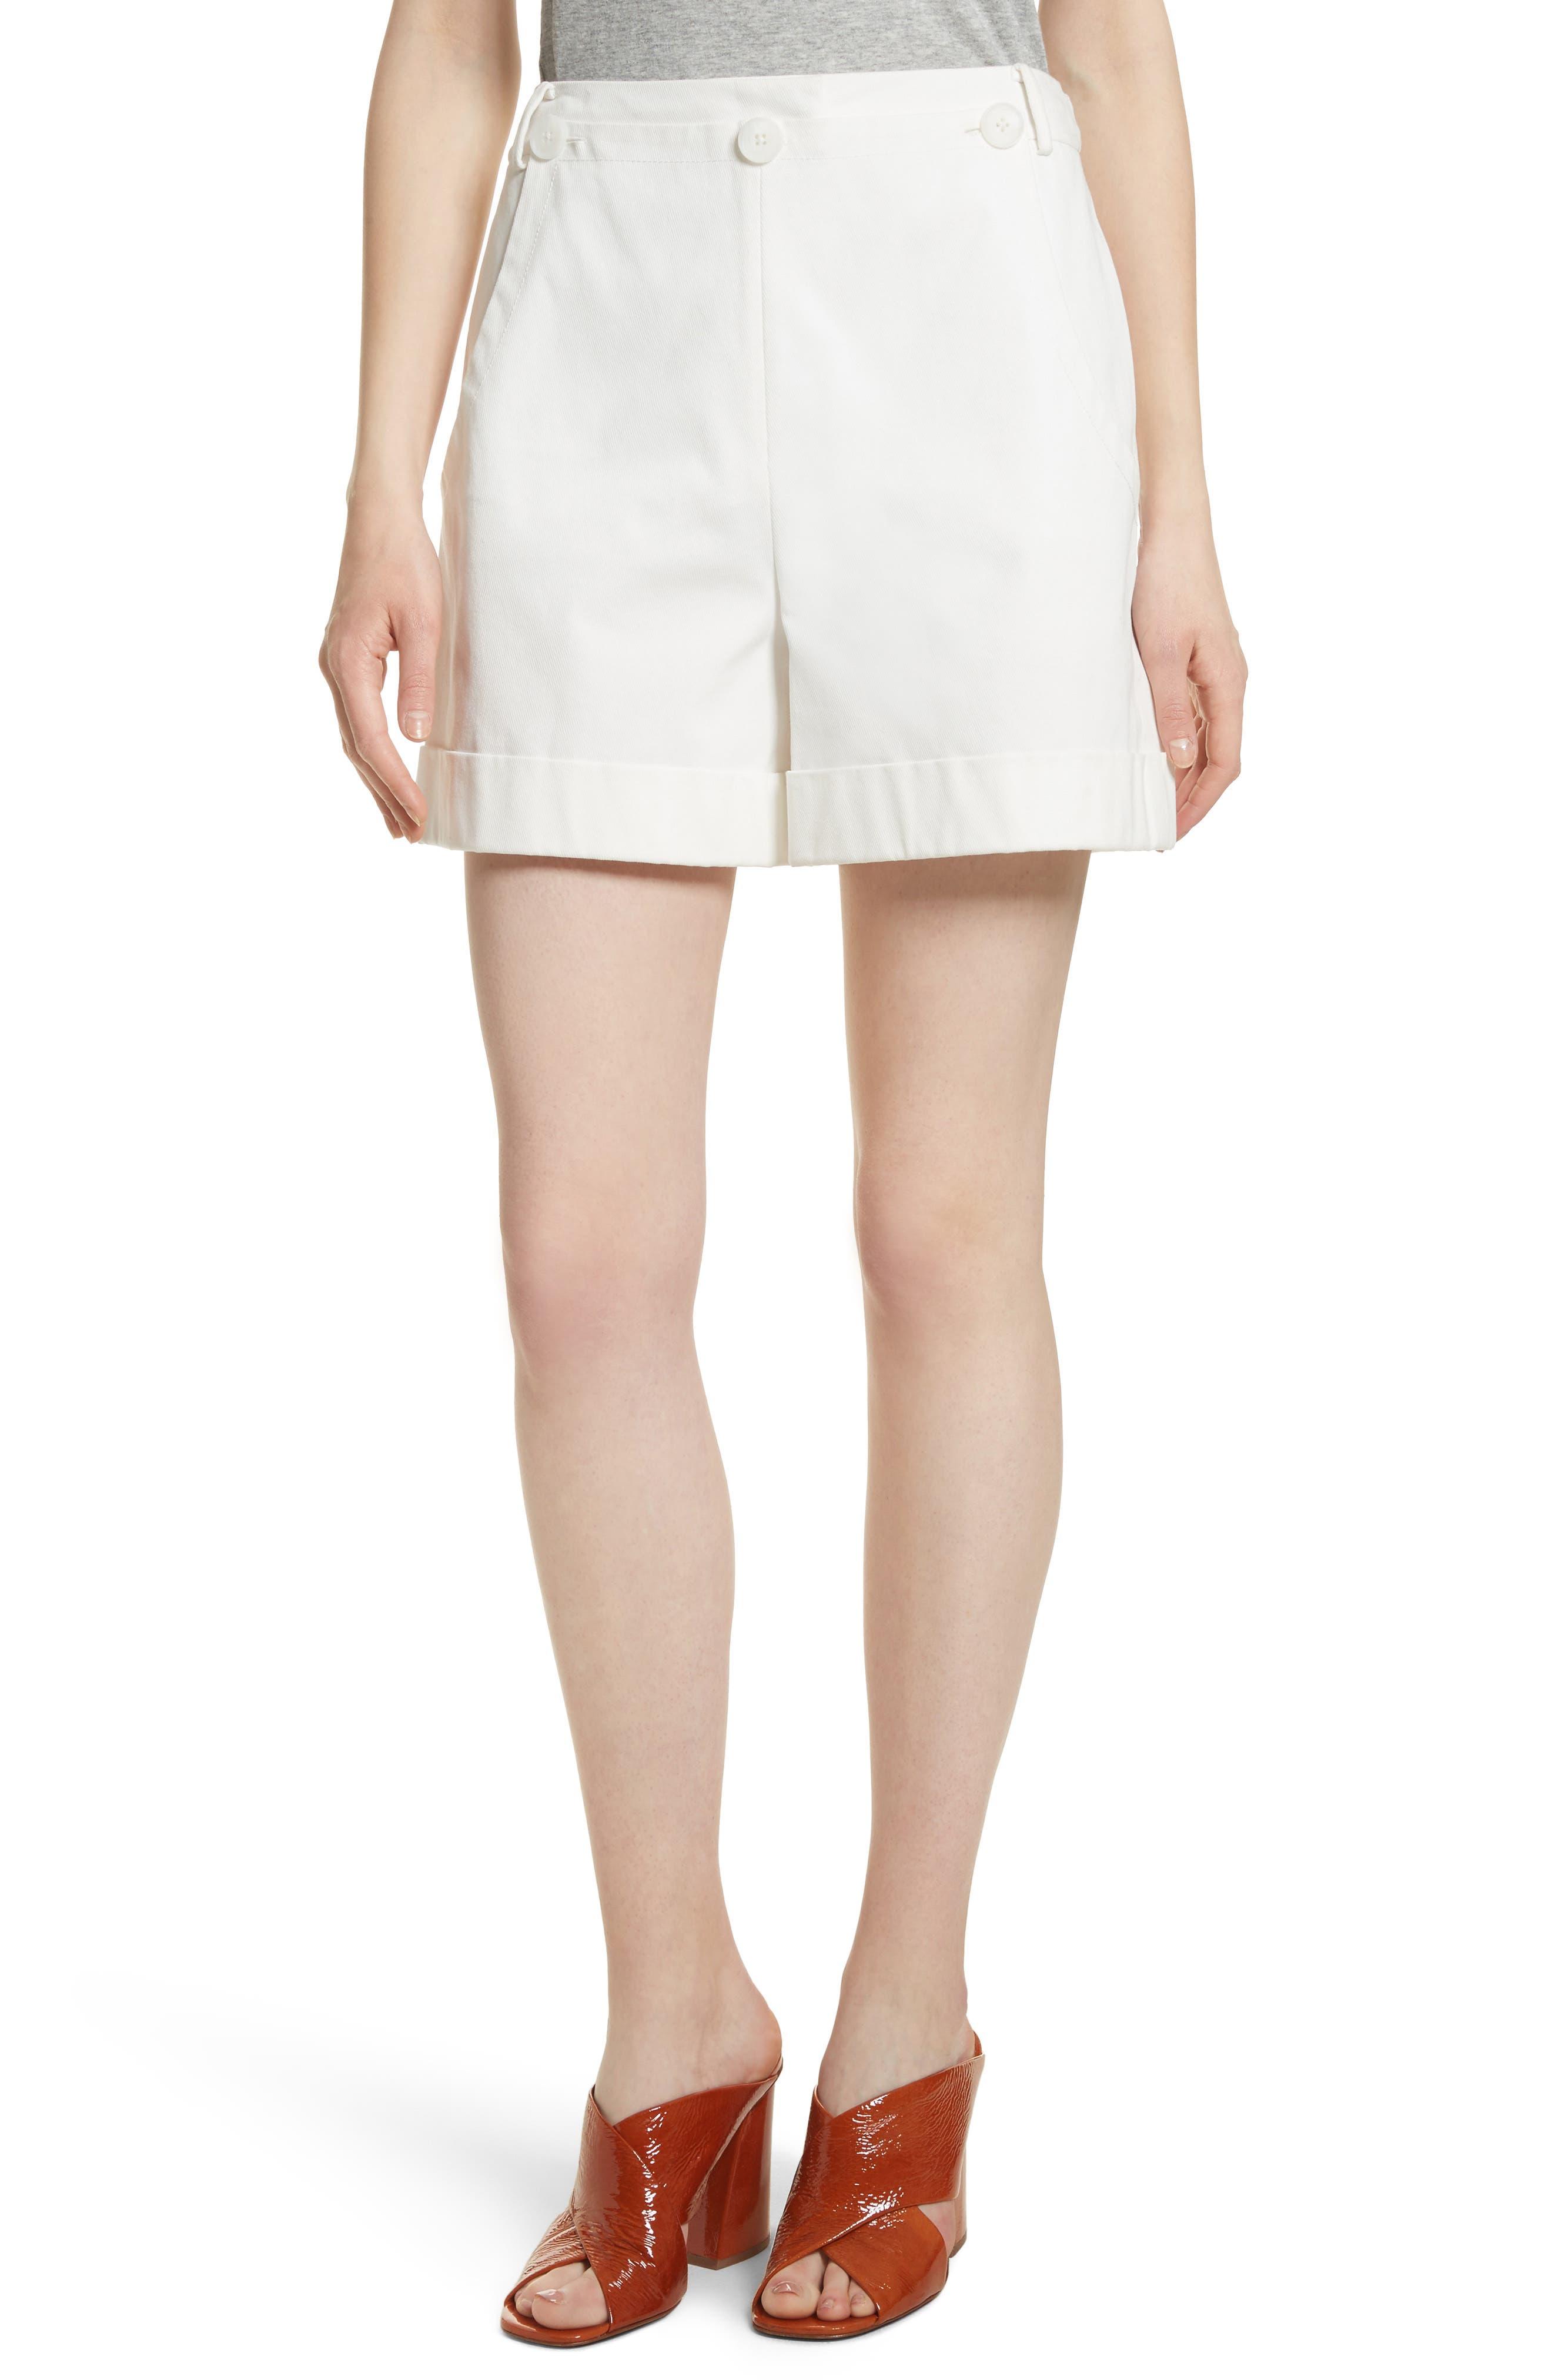 GREY Jason Wu Stretch Cotton Sailor Shorts,                         Main,                         color, 110